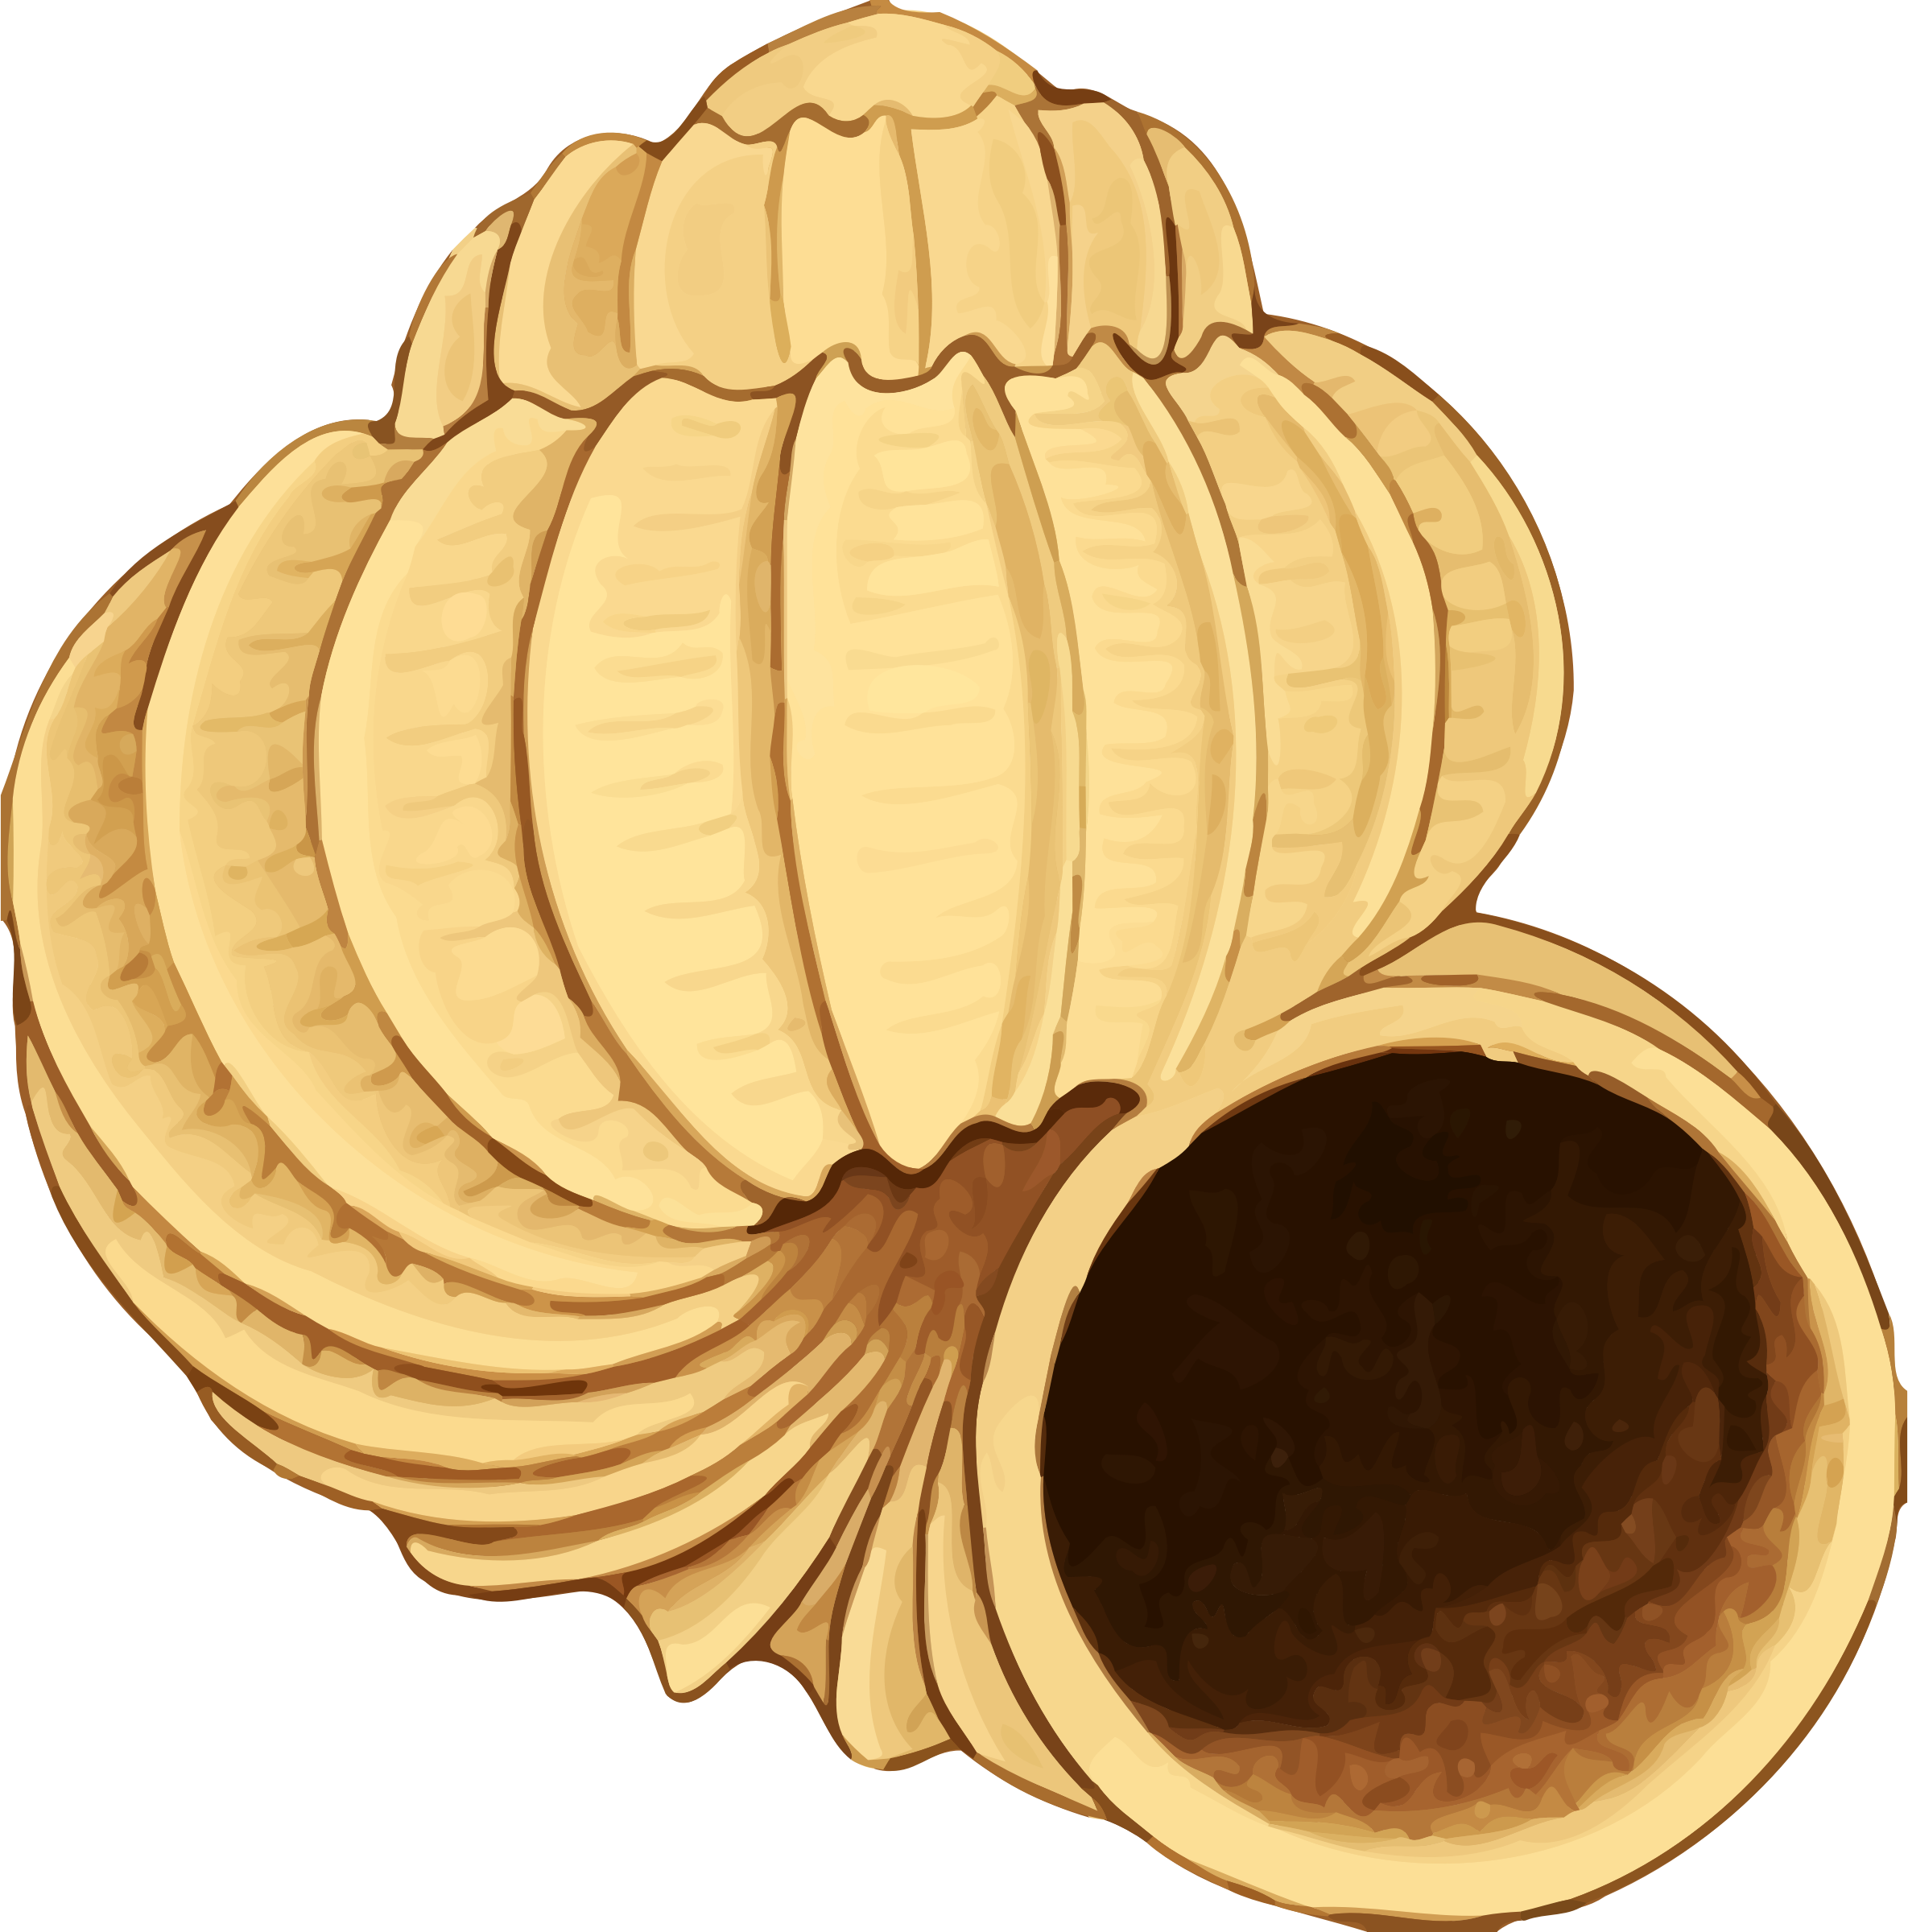 twisting conch shell vector clipart image free stock photo rh goodfreephotos com